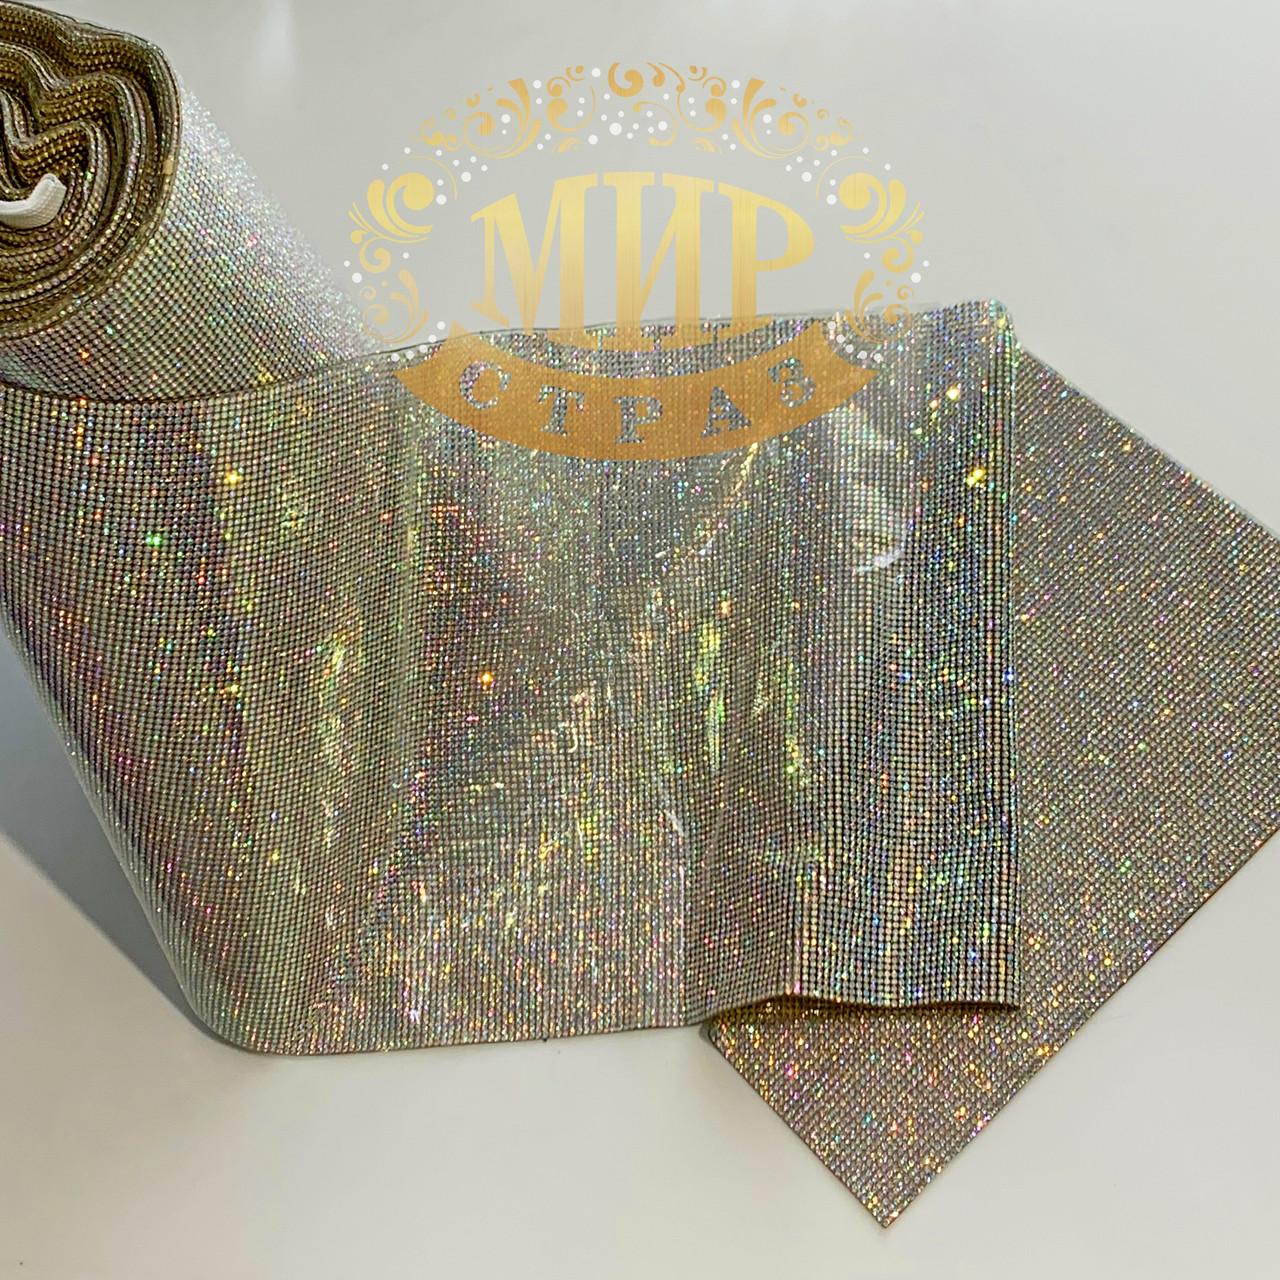 Стразовое термополотно, цвет Crystal AB (хамелеон), 1 м